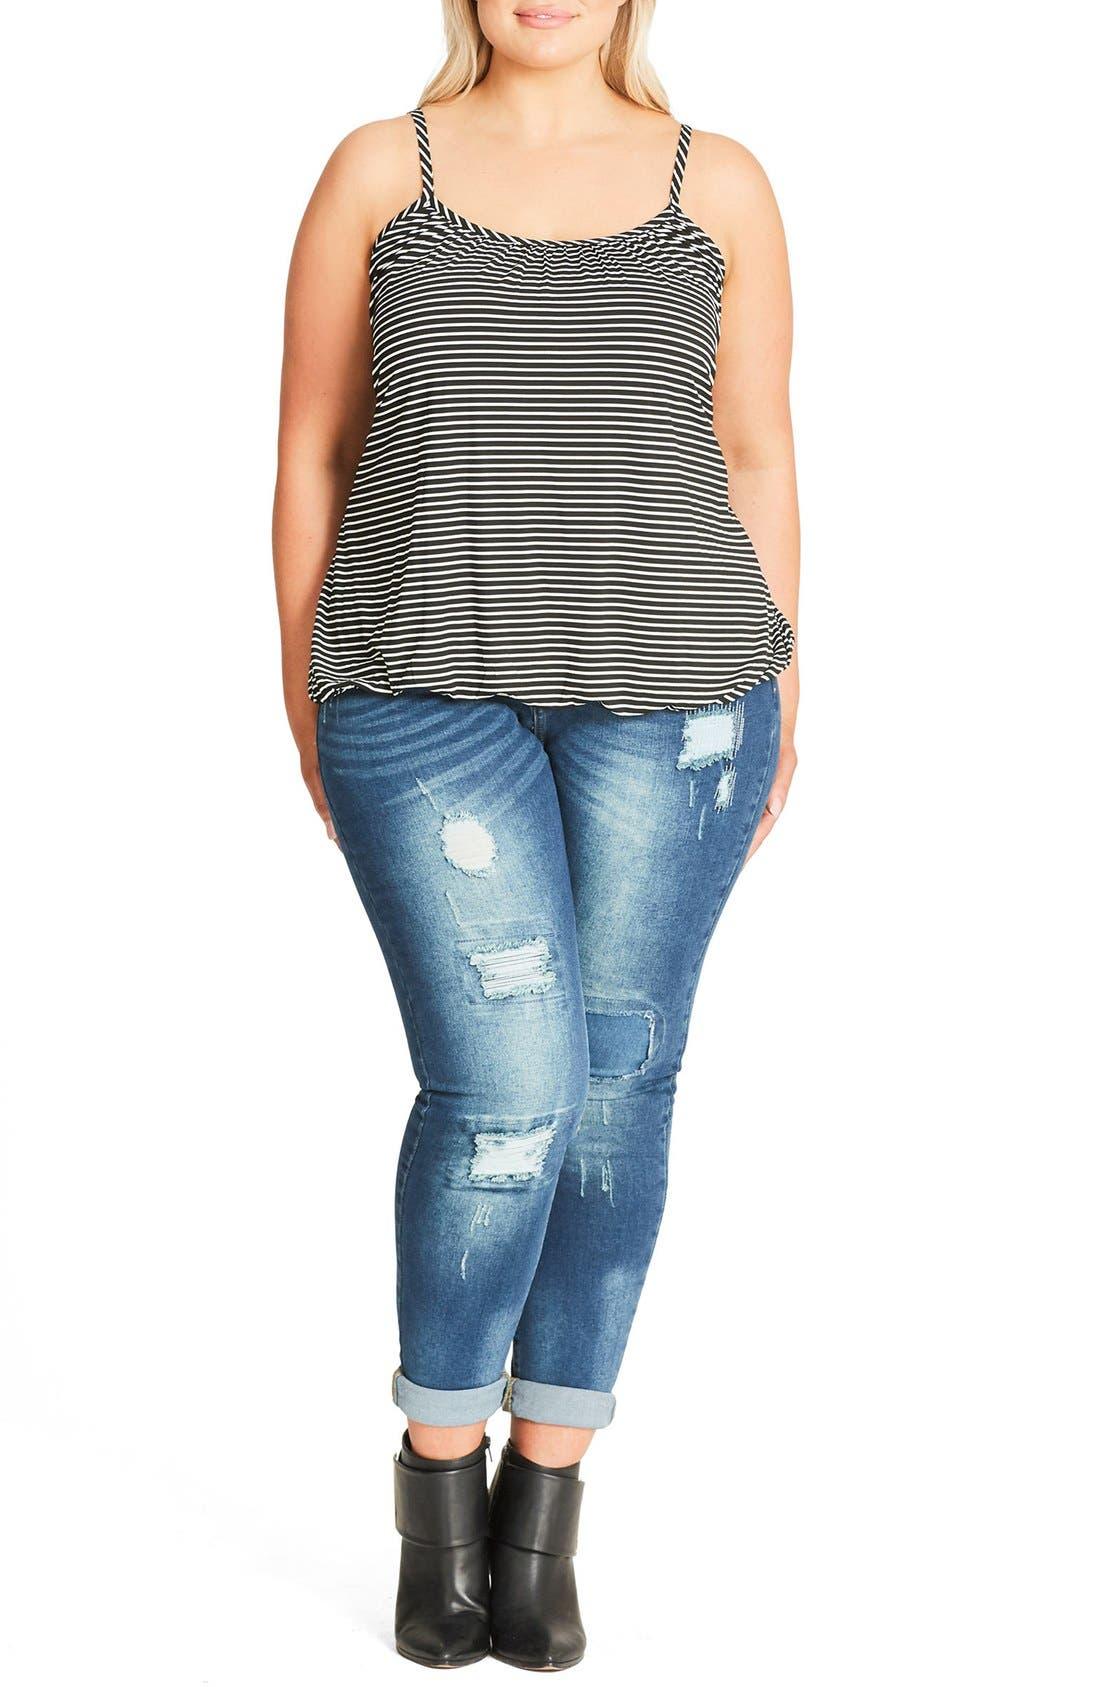 Alternate Image 1 Selected - City Chic Stripe Bubble Hem Camisole (Plus Size)